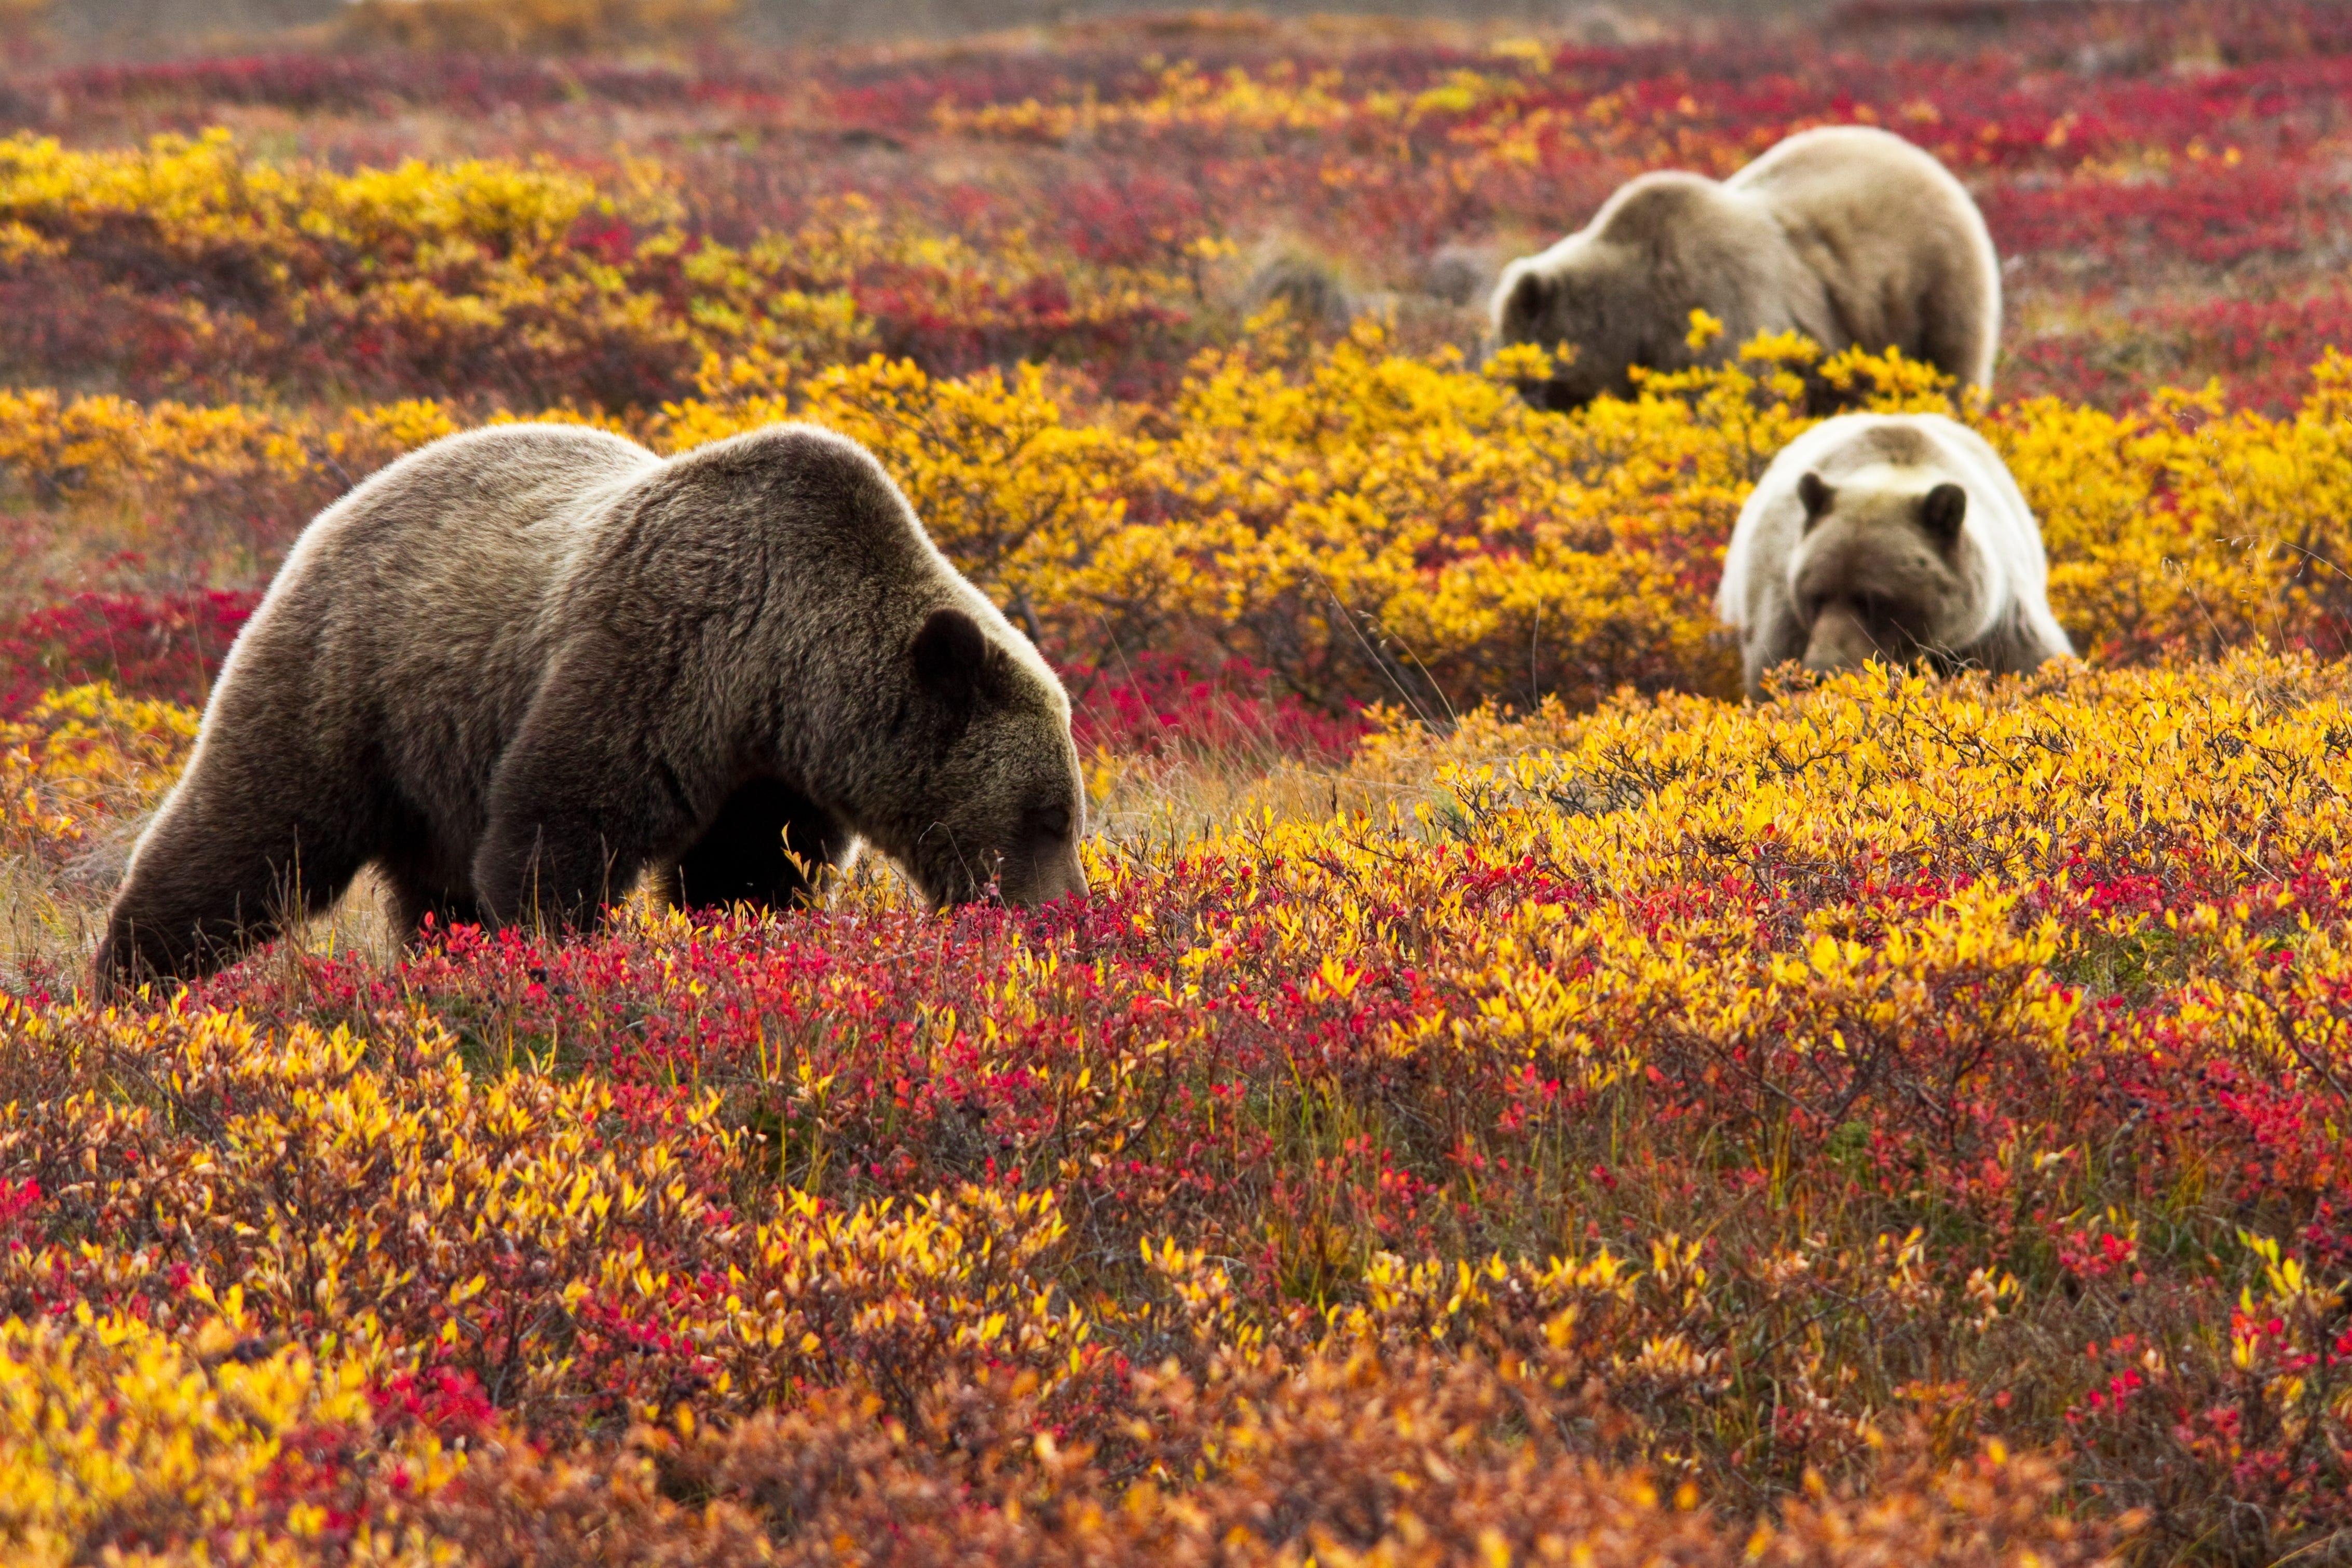 Denali National Park: Wild, scenic beauty